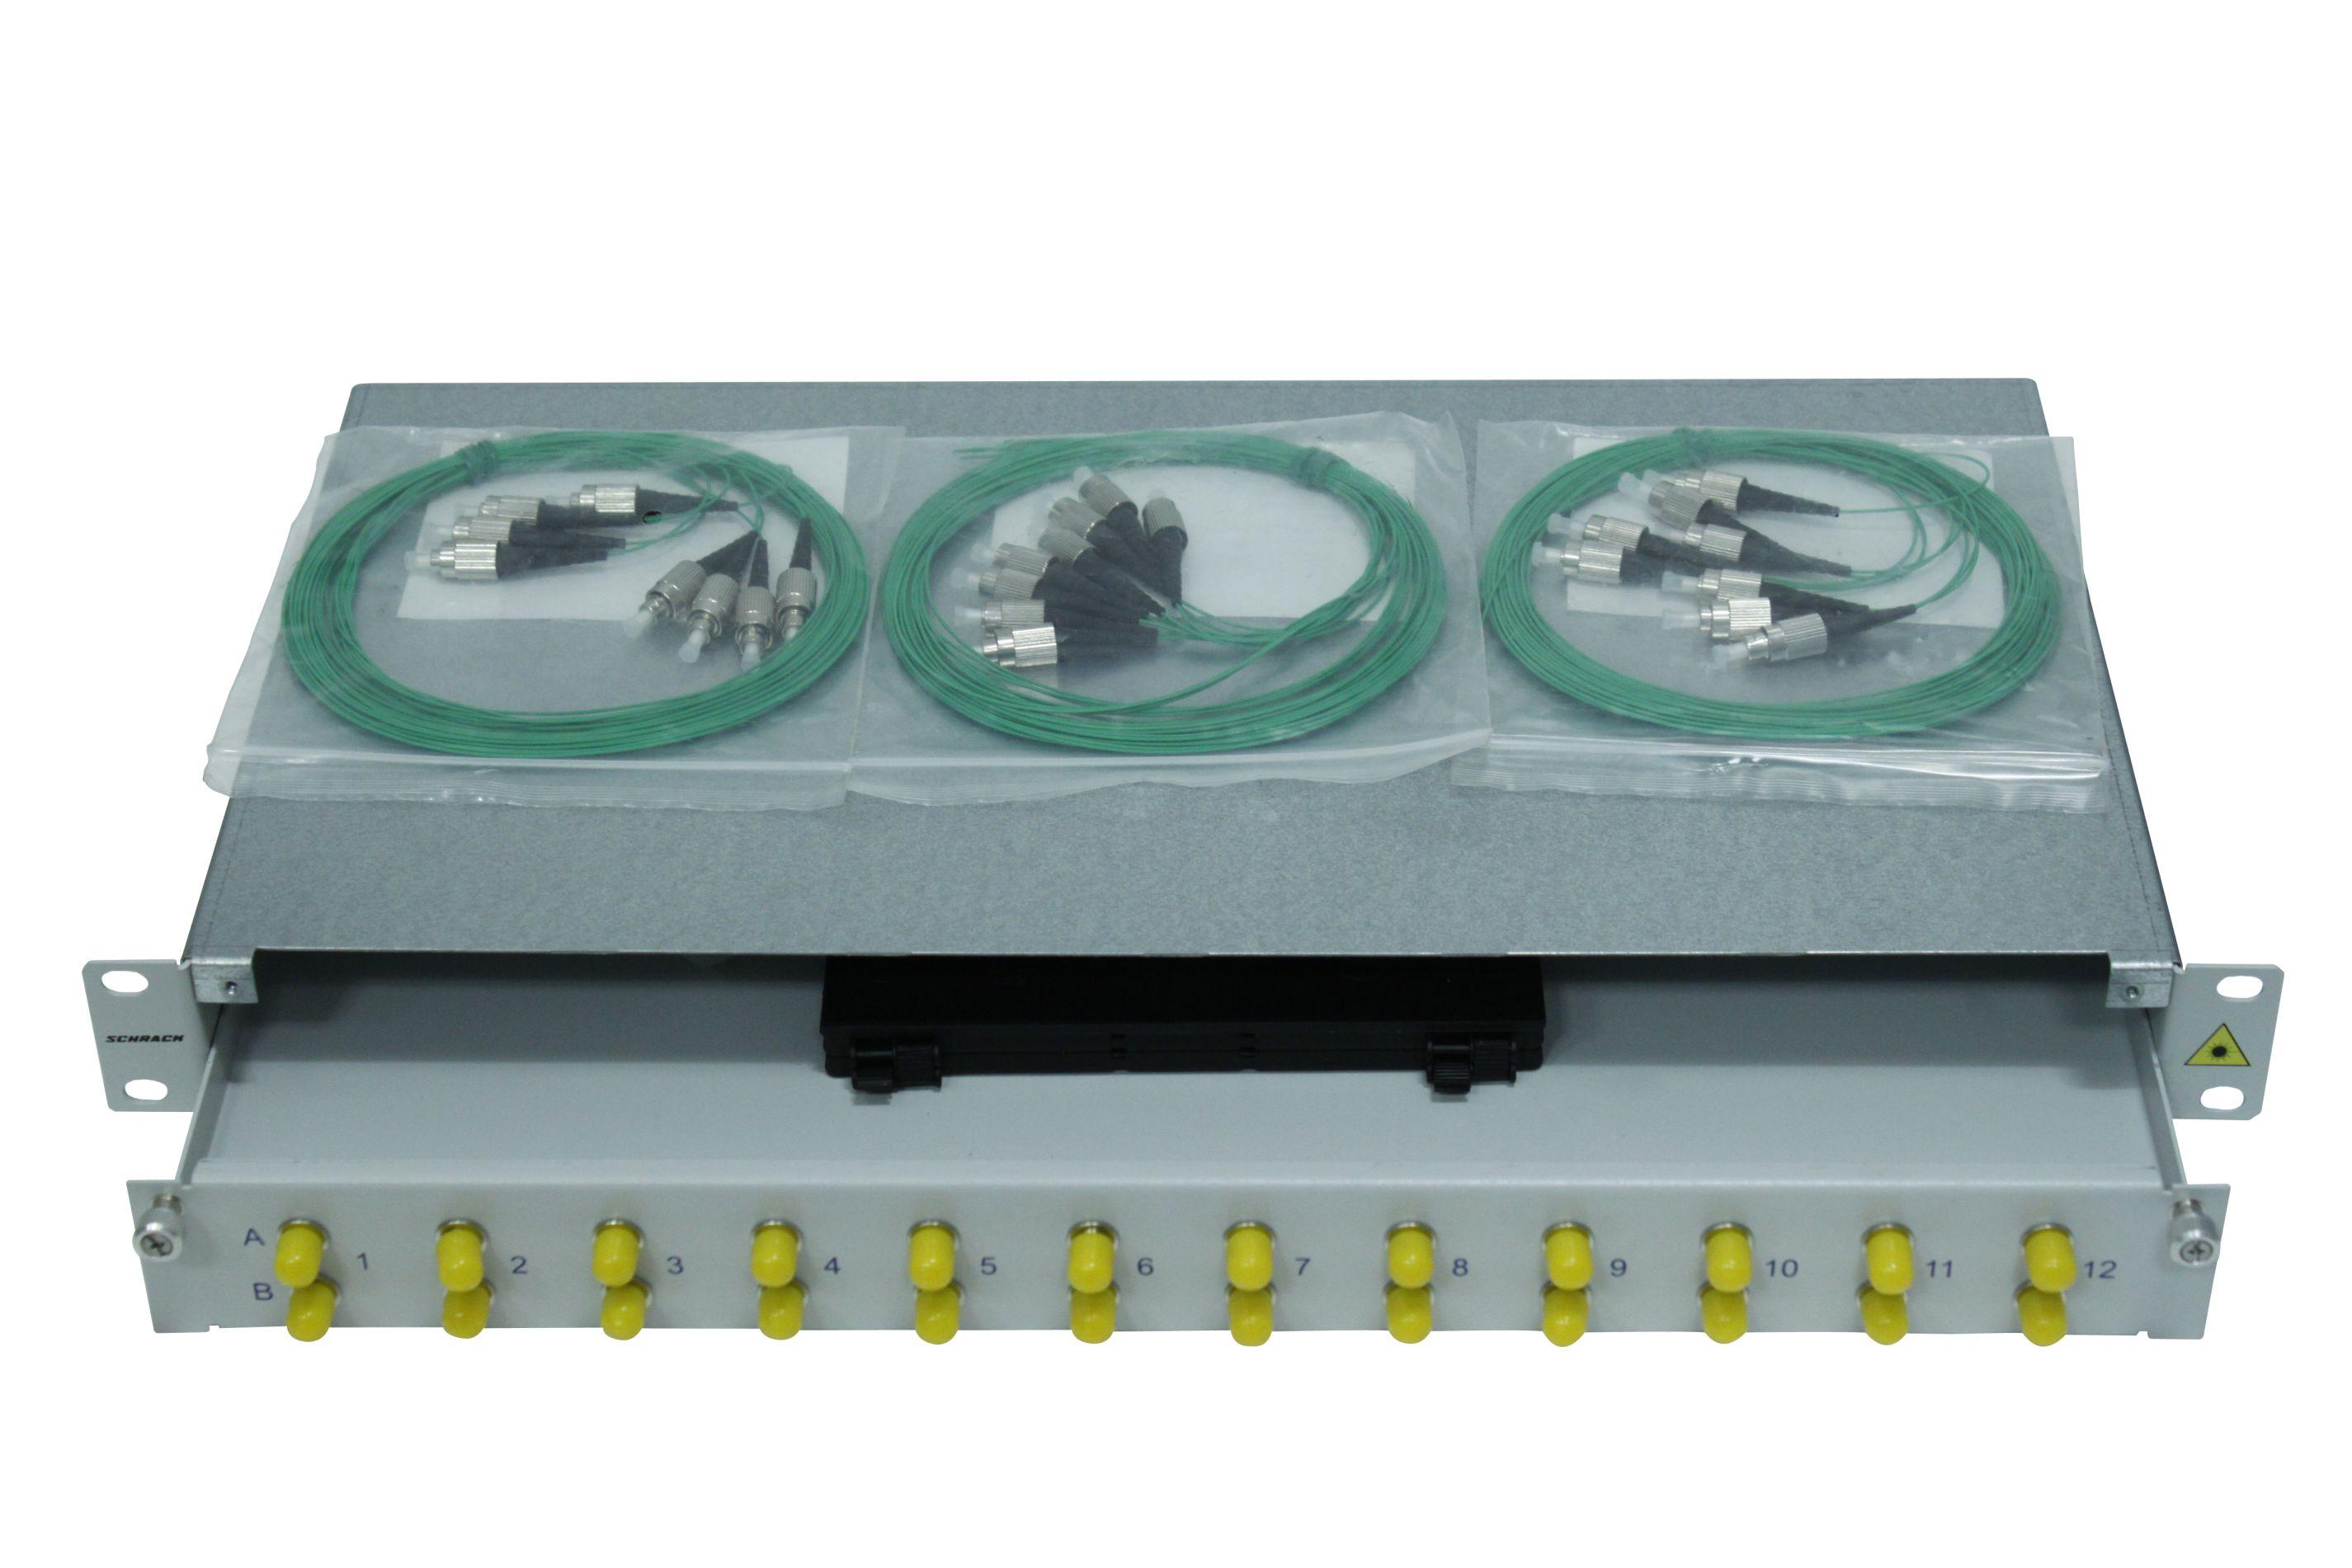 1 Stk LWL Spleißbox, 8Fasern,FC, 9/125µm OS2, ausziehbar,19,1HE HSELS089FG